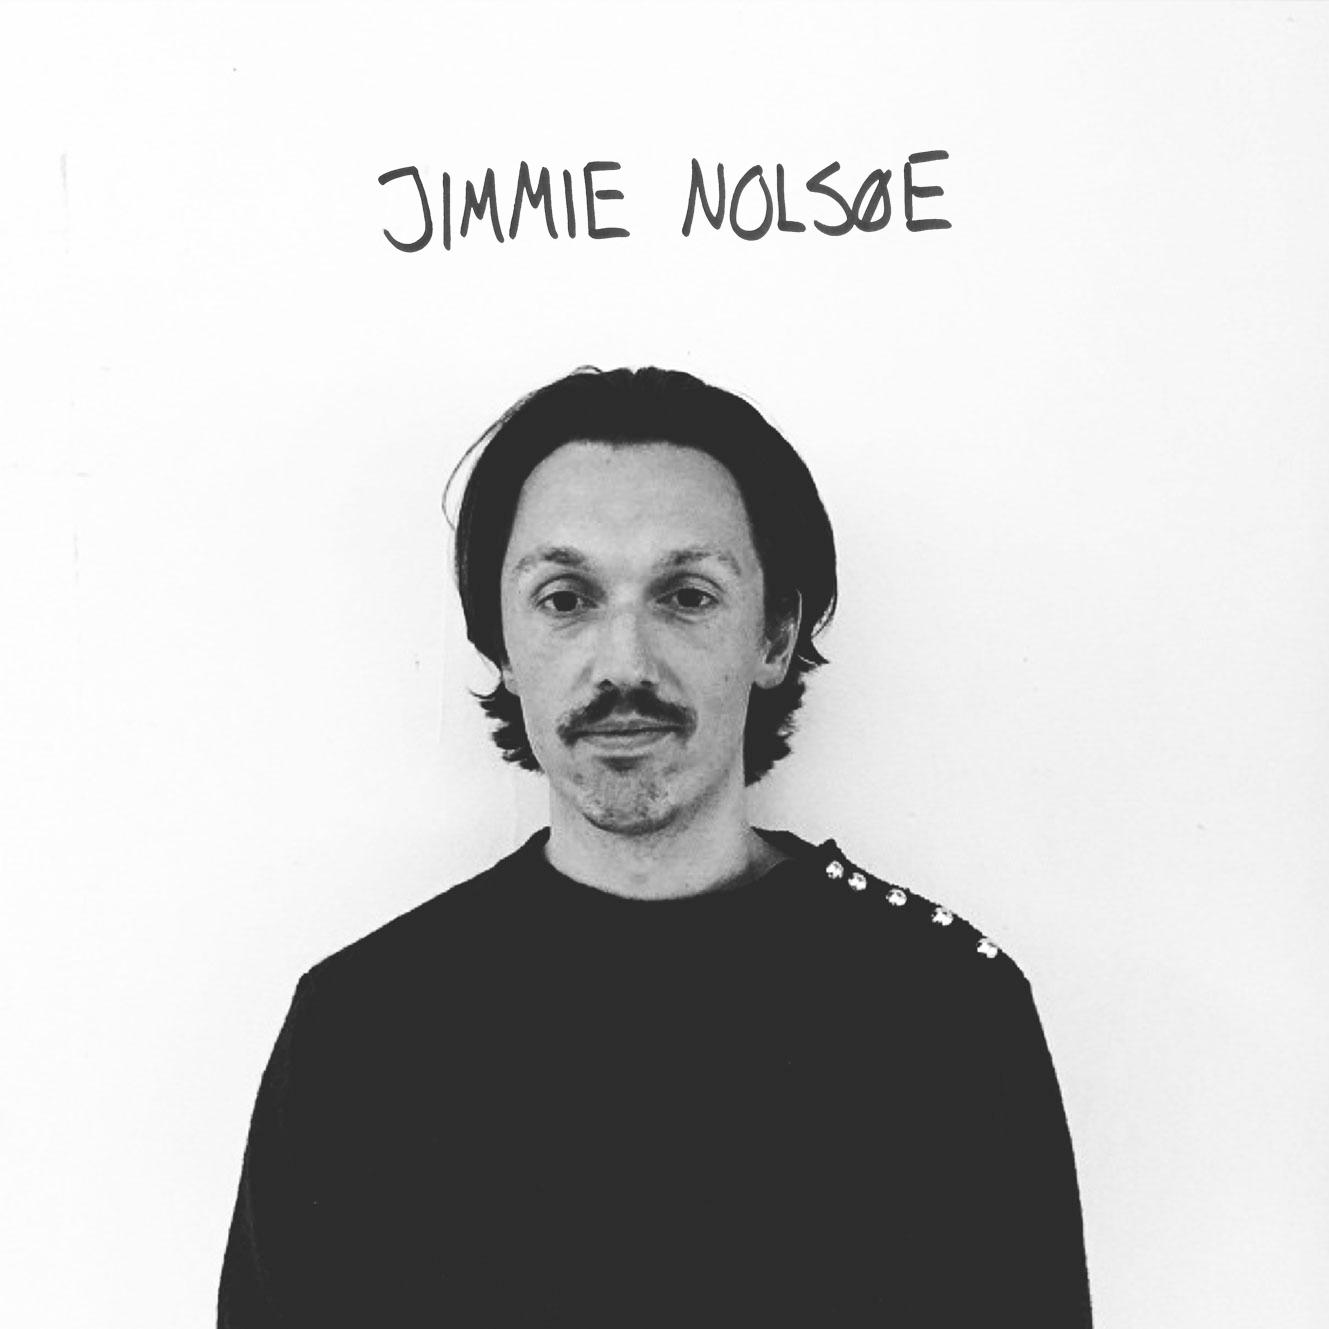 JIMMIE NOLSØE